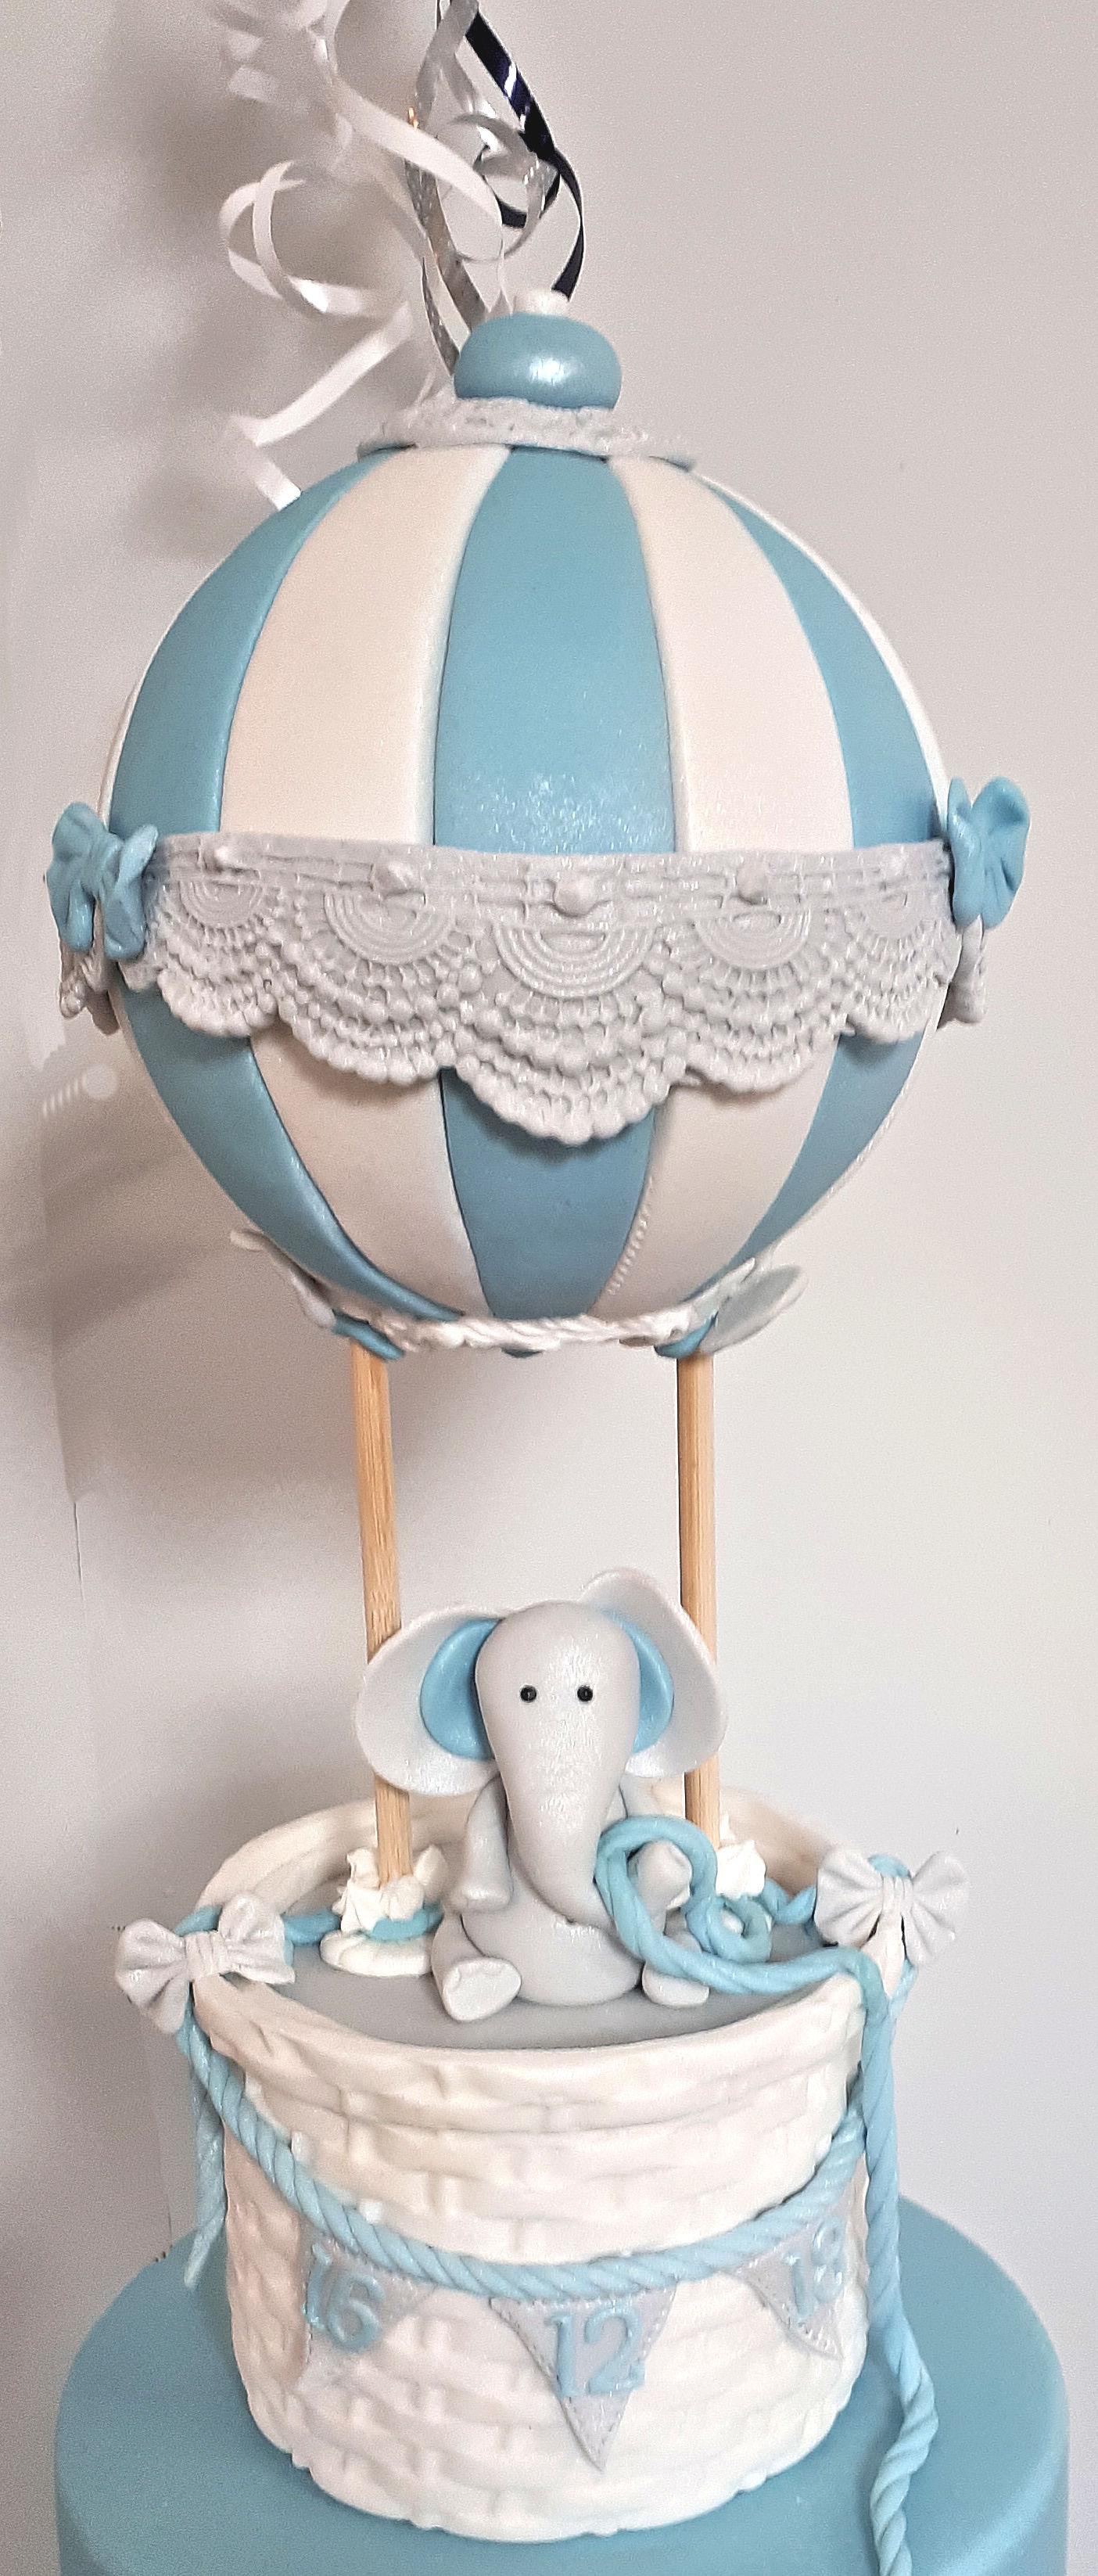 Air balloon Boys Christening cake 2.jpg